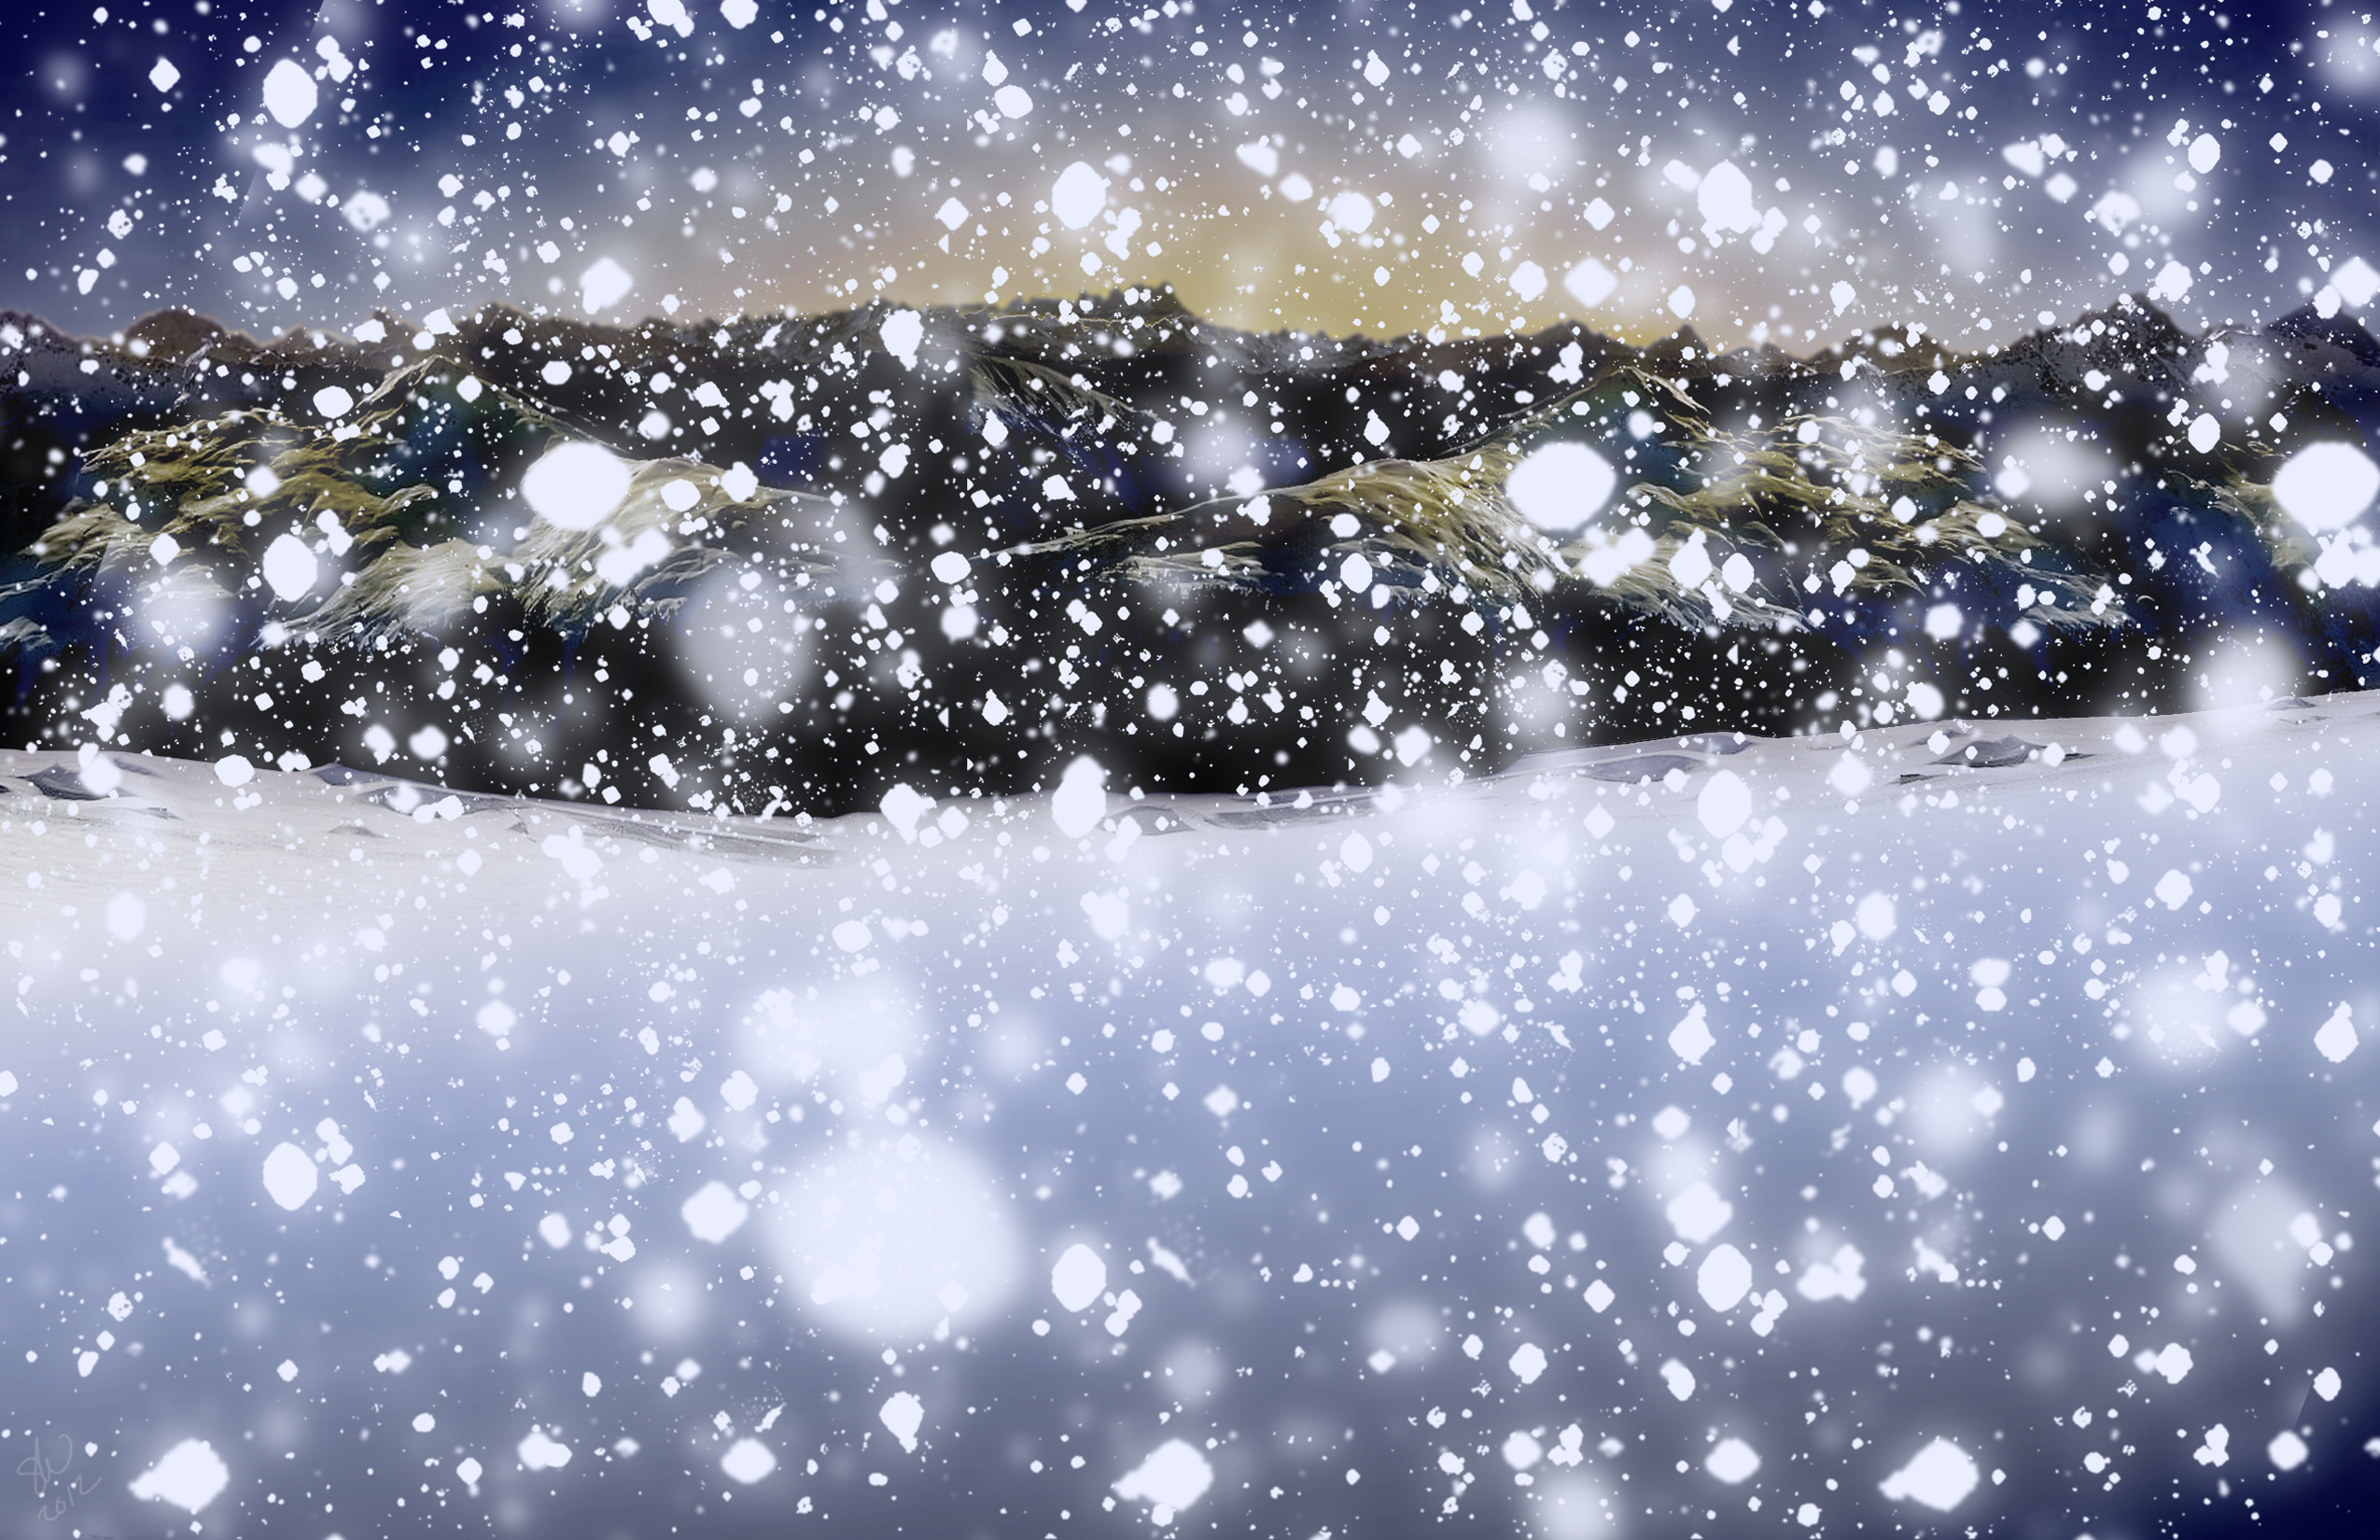 Snow Scene Blue Snowy Day Night Evening Mountain Desktop Wallpaper .